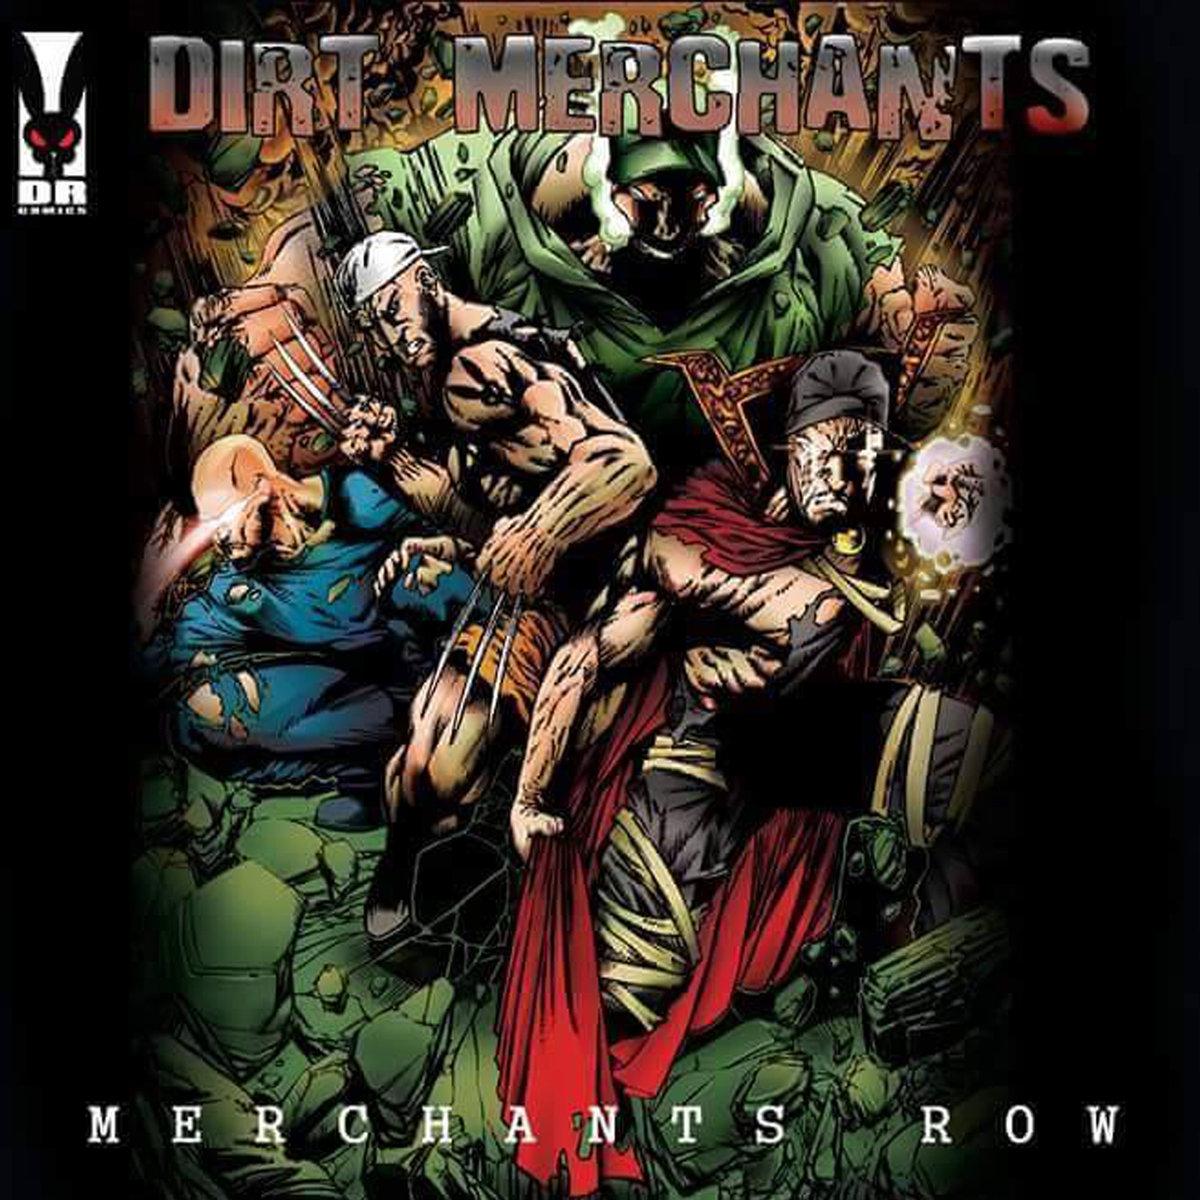 Dirt_merchants_presenta__merchants_row_